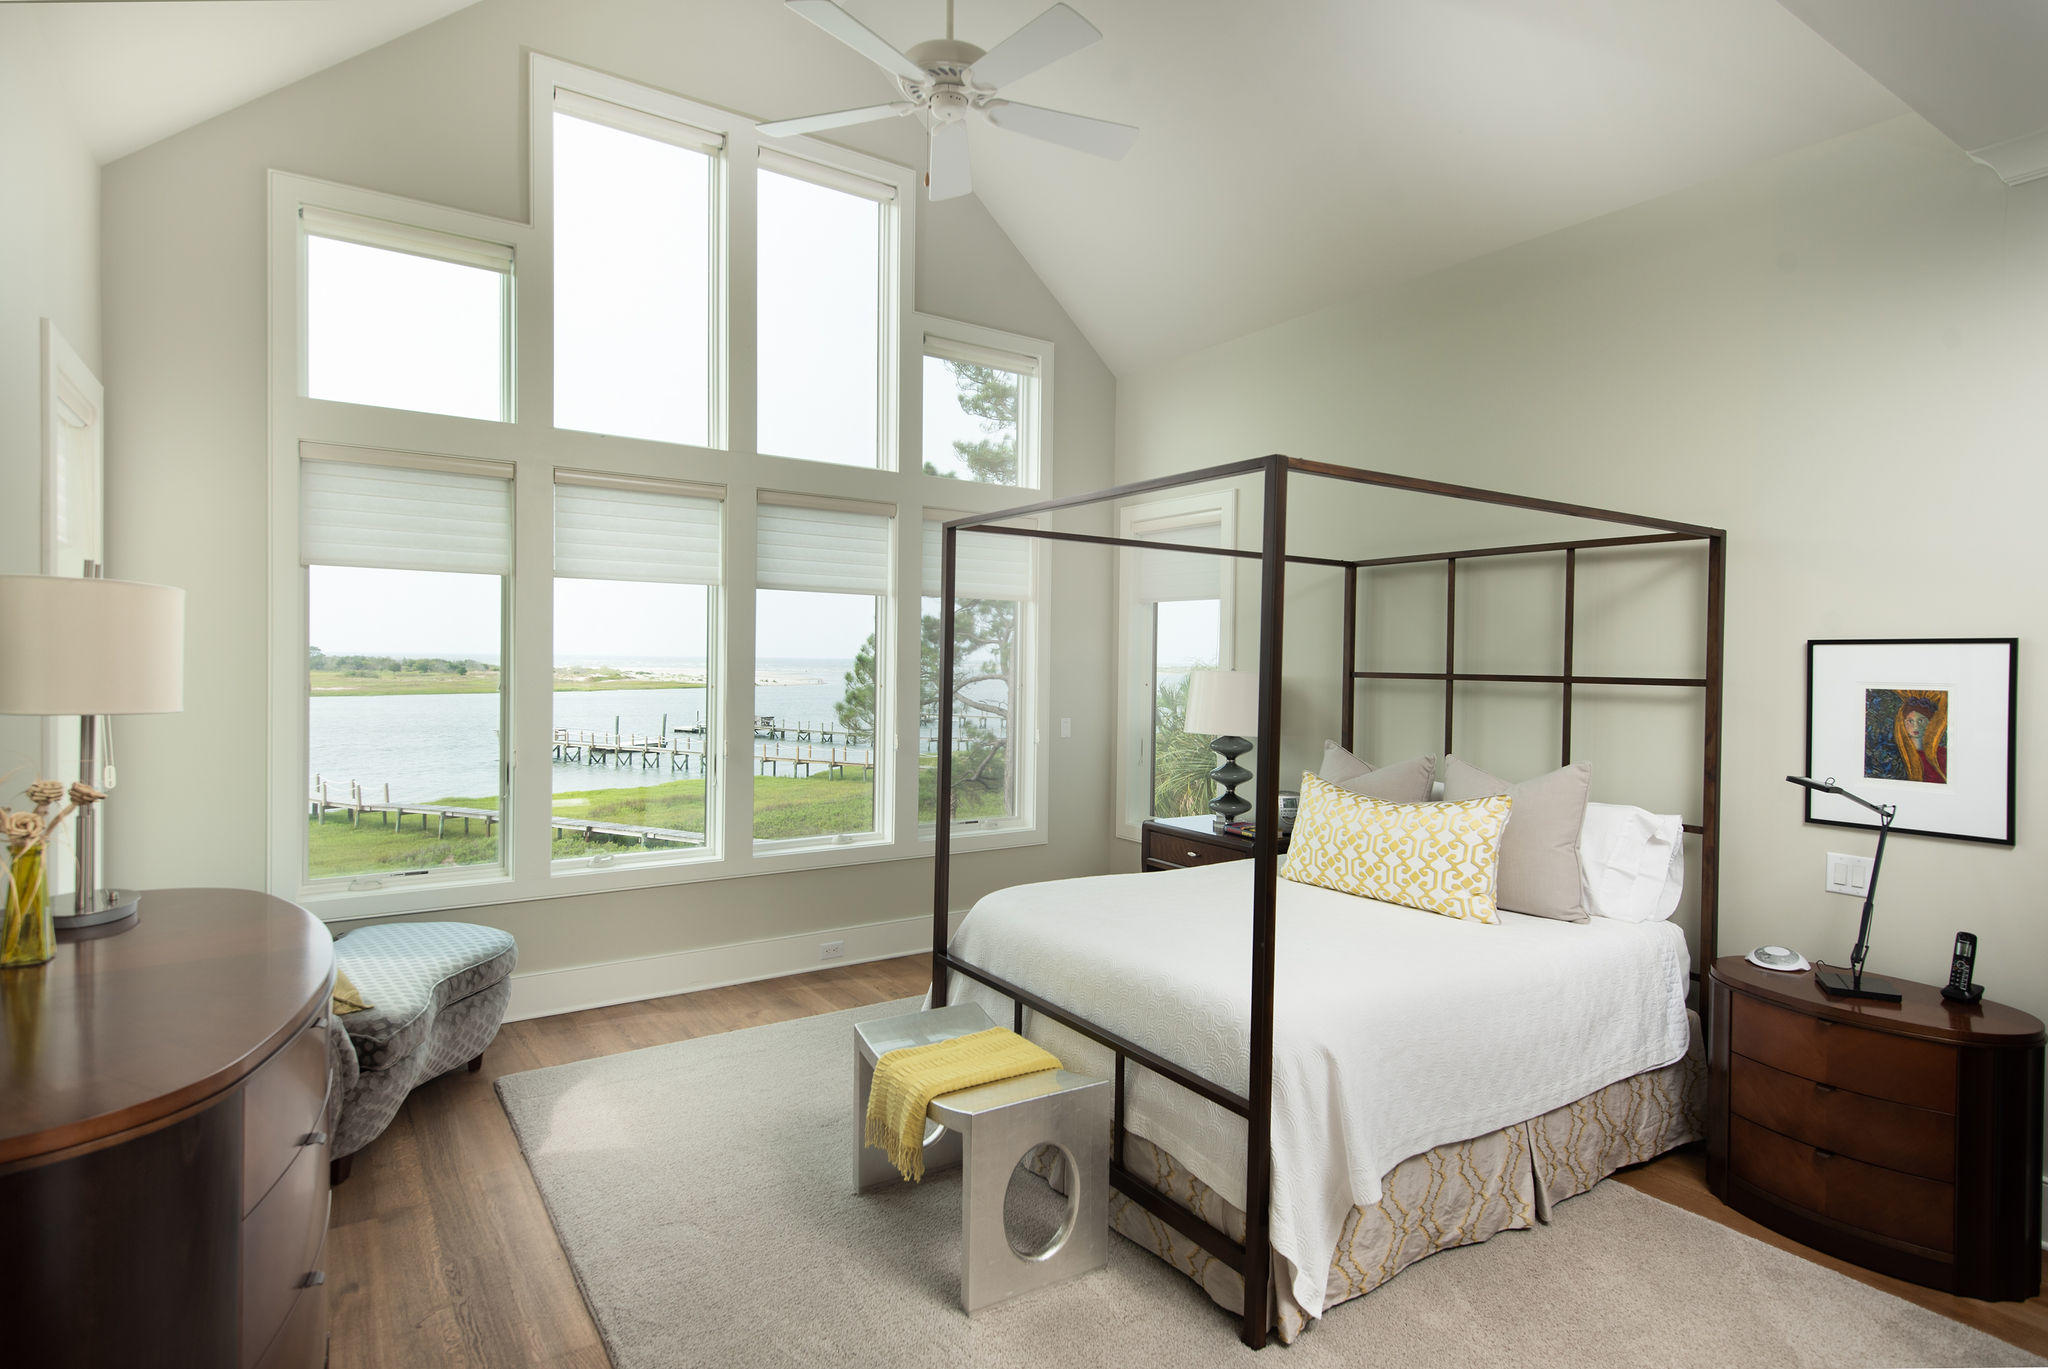 Seabrook Island Homes For Sale - 3135 Marshgate, Seabrook Island, SC - 38